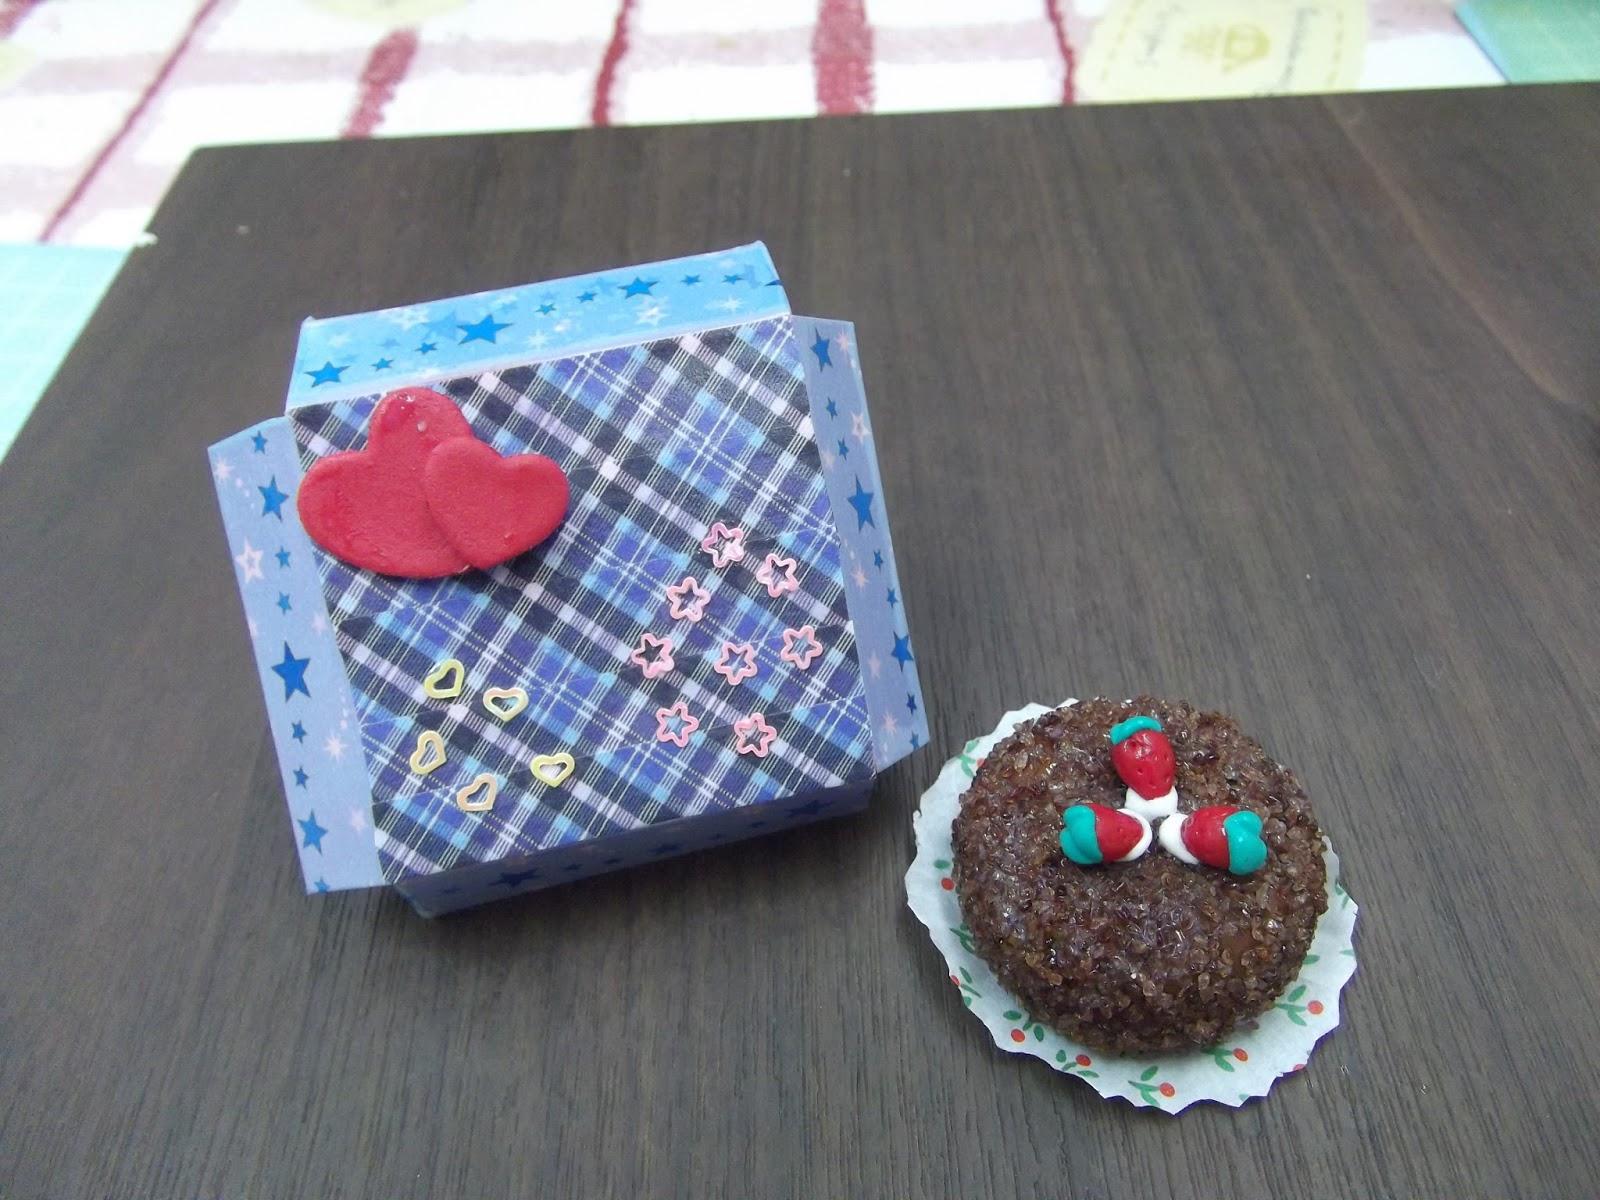 Design Your Own Cake Box : Kin  Miniature Workshop Handmade Clay Food by Kin Quek ...